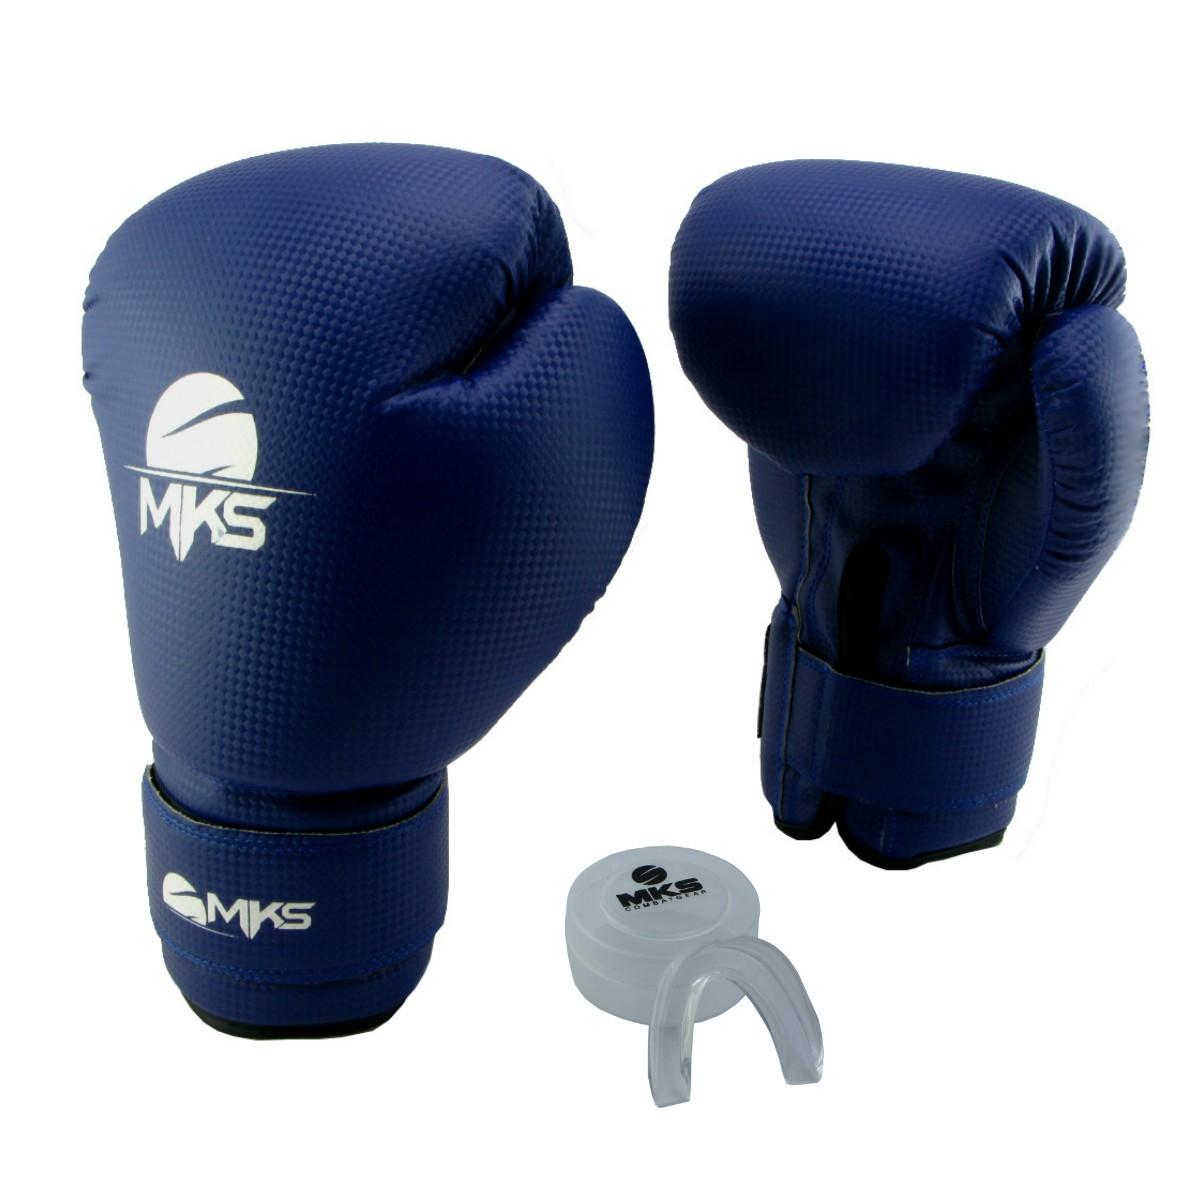 Luva de Boxe Prospect MKS Blue 14 oz + Protetor Bucal